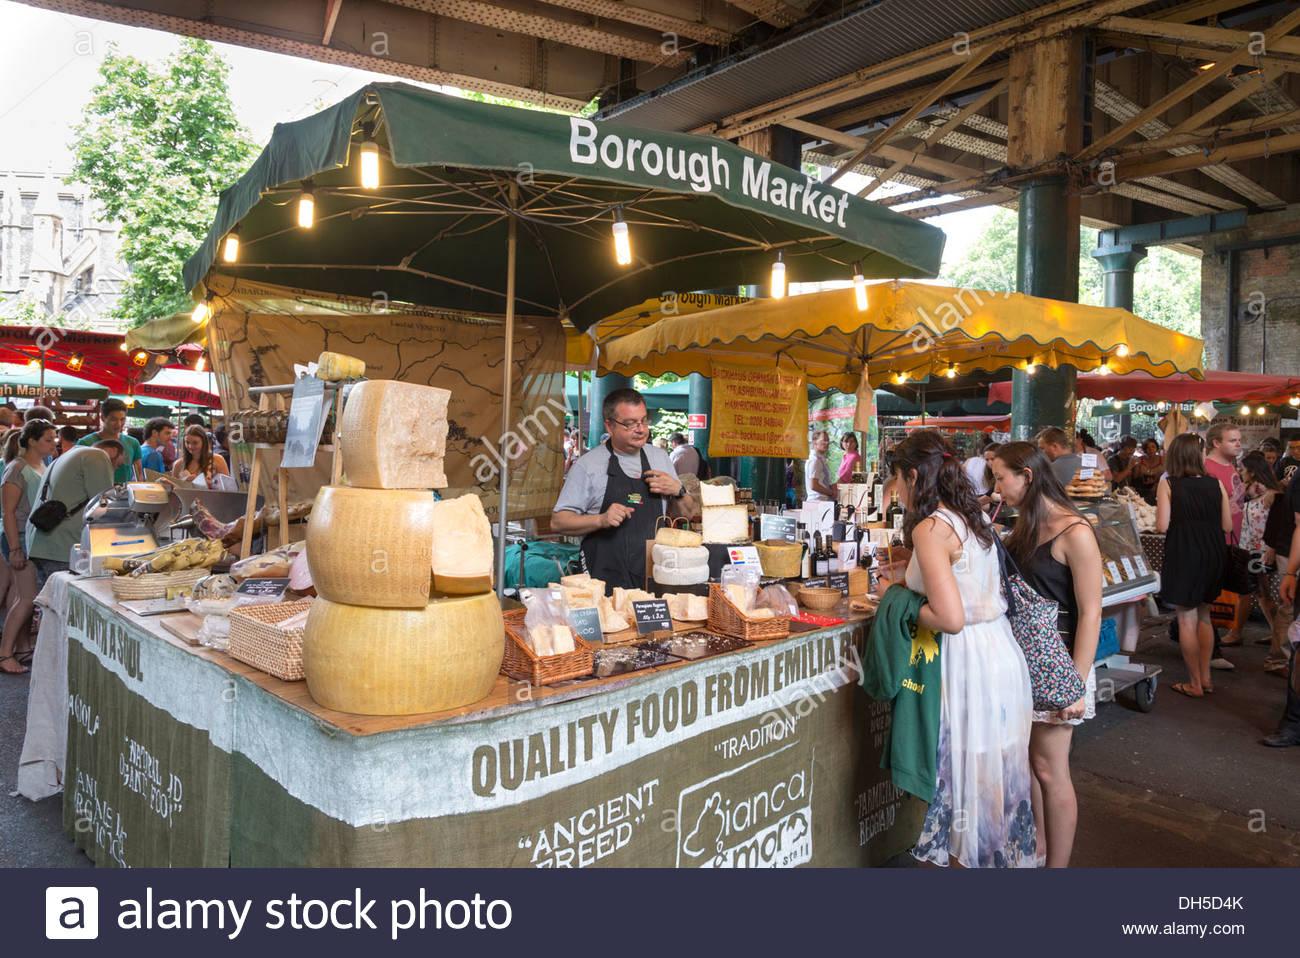 Borough Market cheese stall, London, England, UK - Stock Image